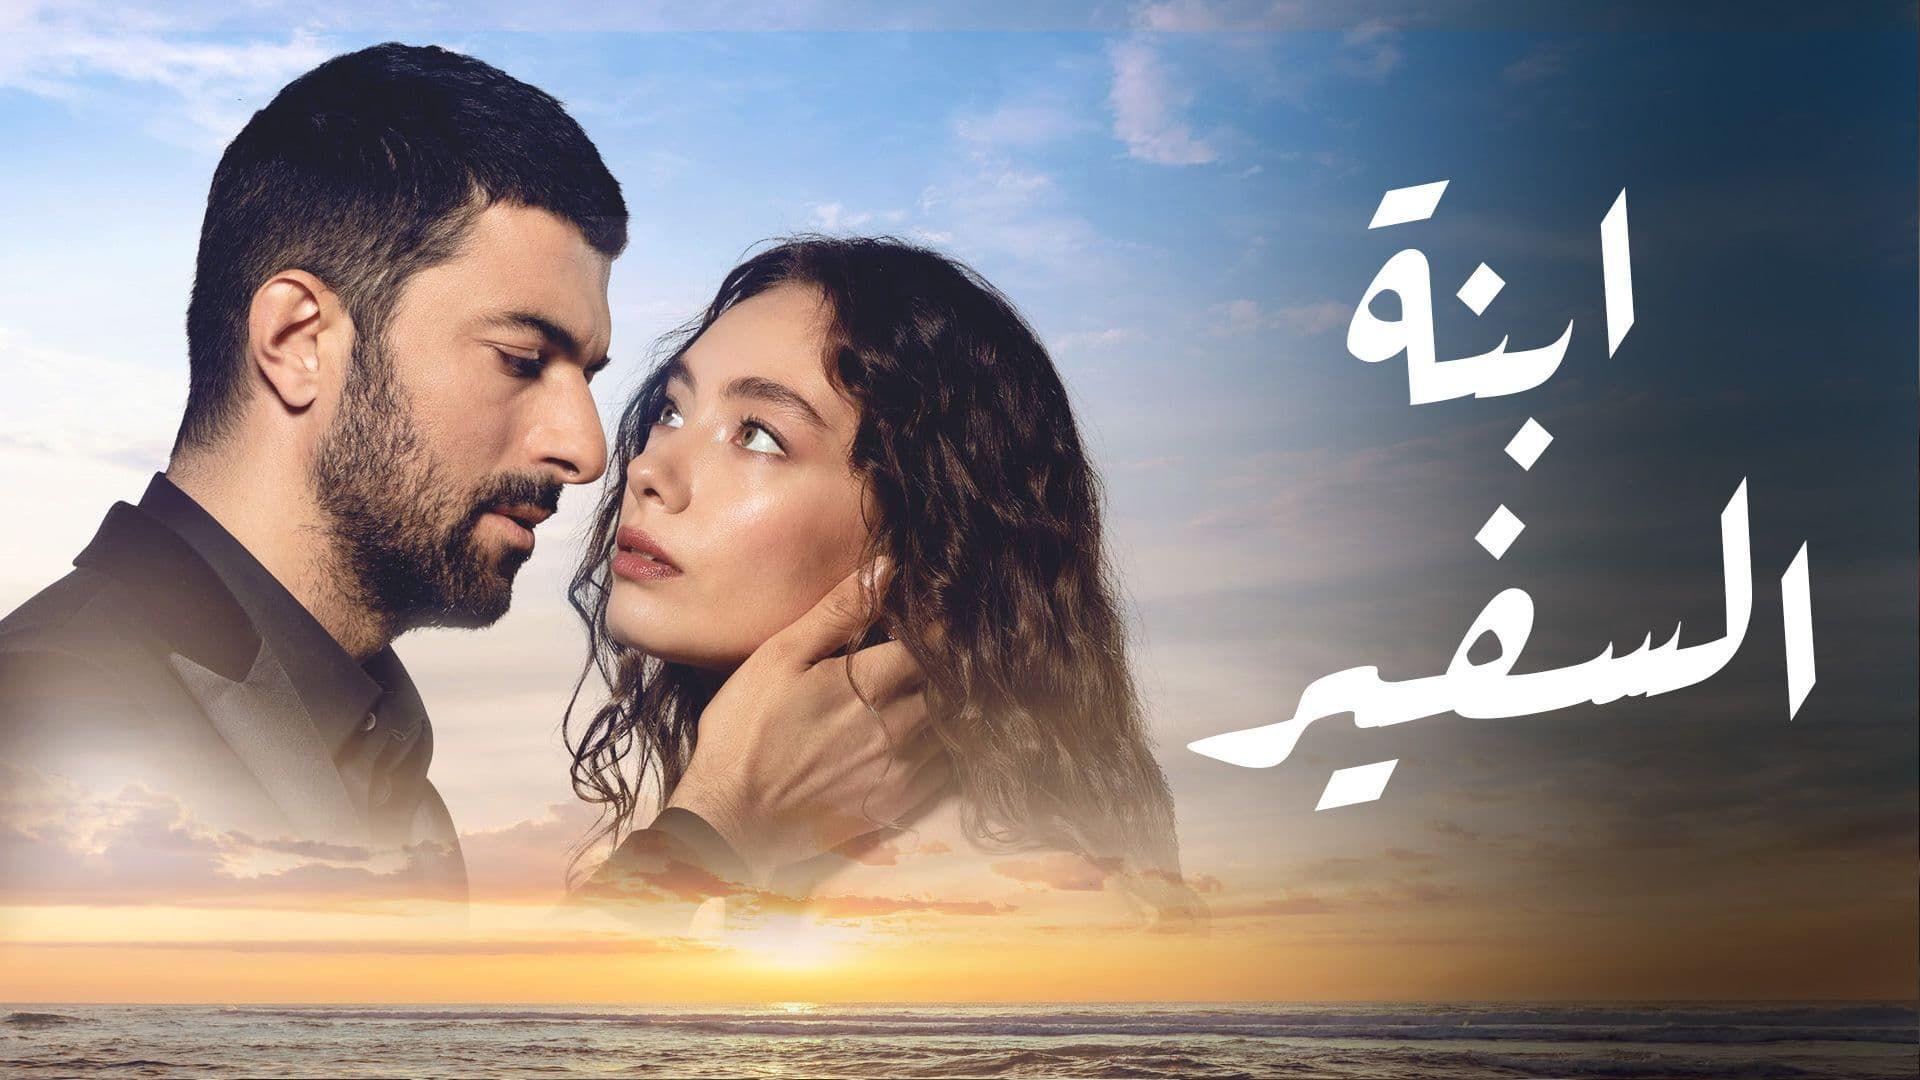 مسلسل ابنة السفير مترجم قصة عشق Movie Posters Movies Youtube